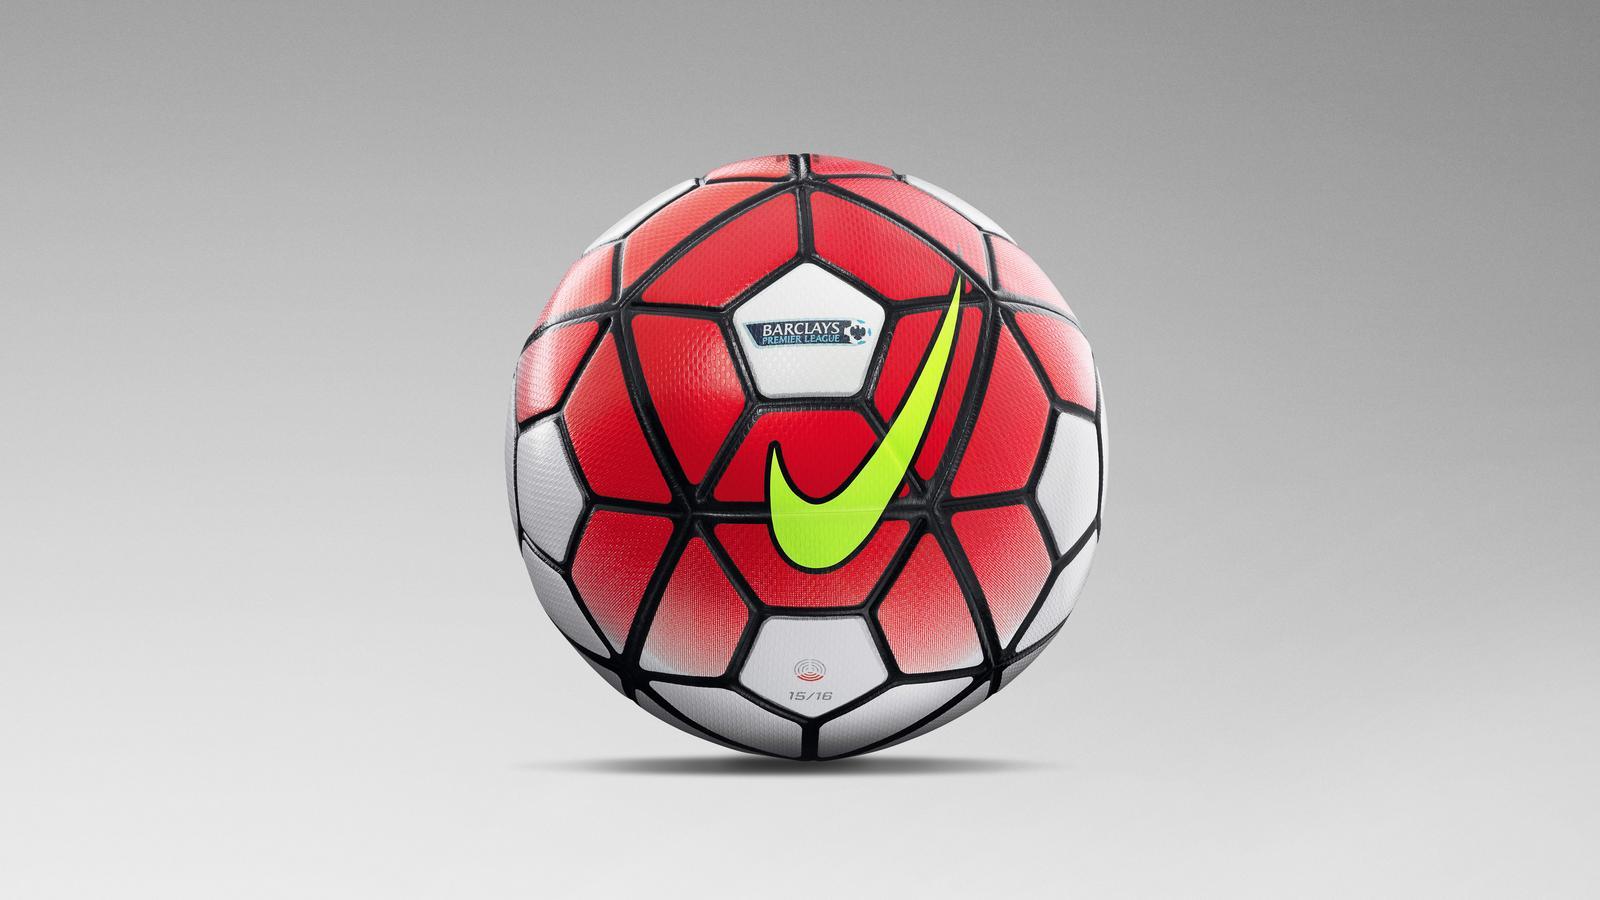 Nike Ordem 3 Football Brings Unrivalled Flight to Europe s Top ... e3eaa0dd3b52c